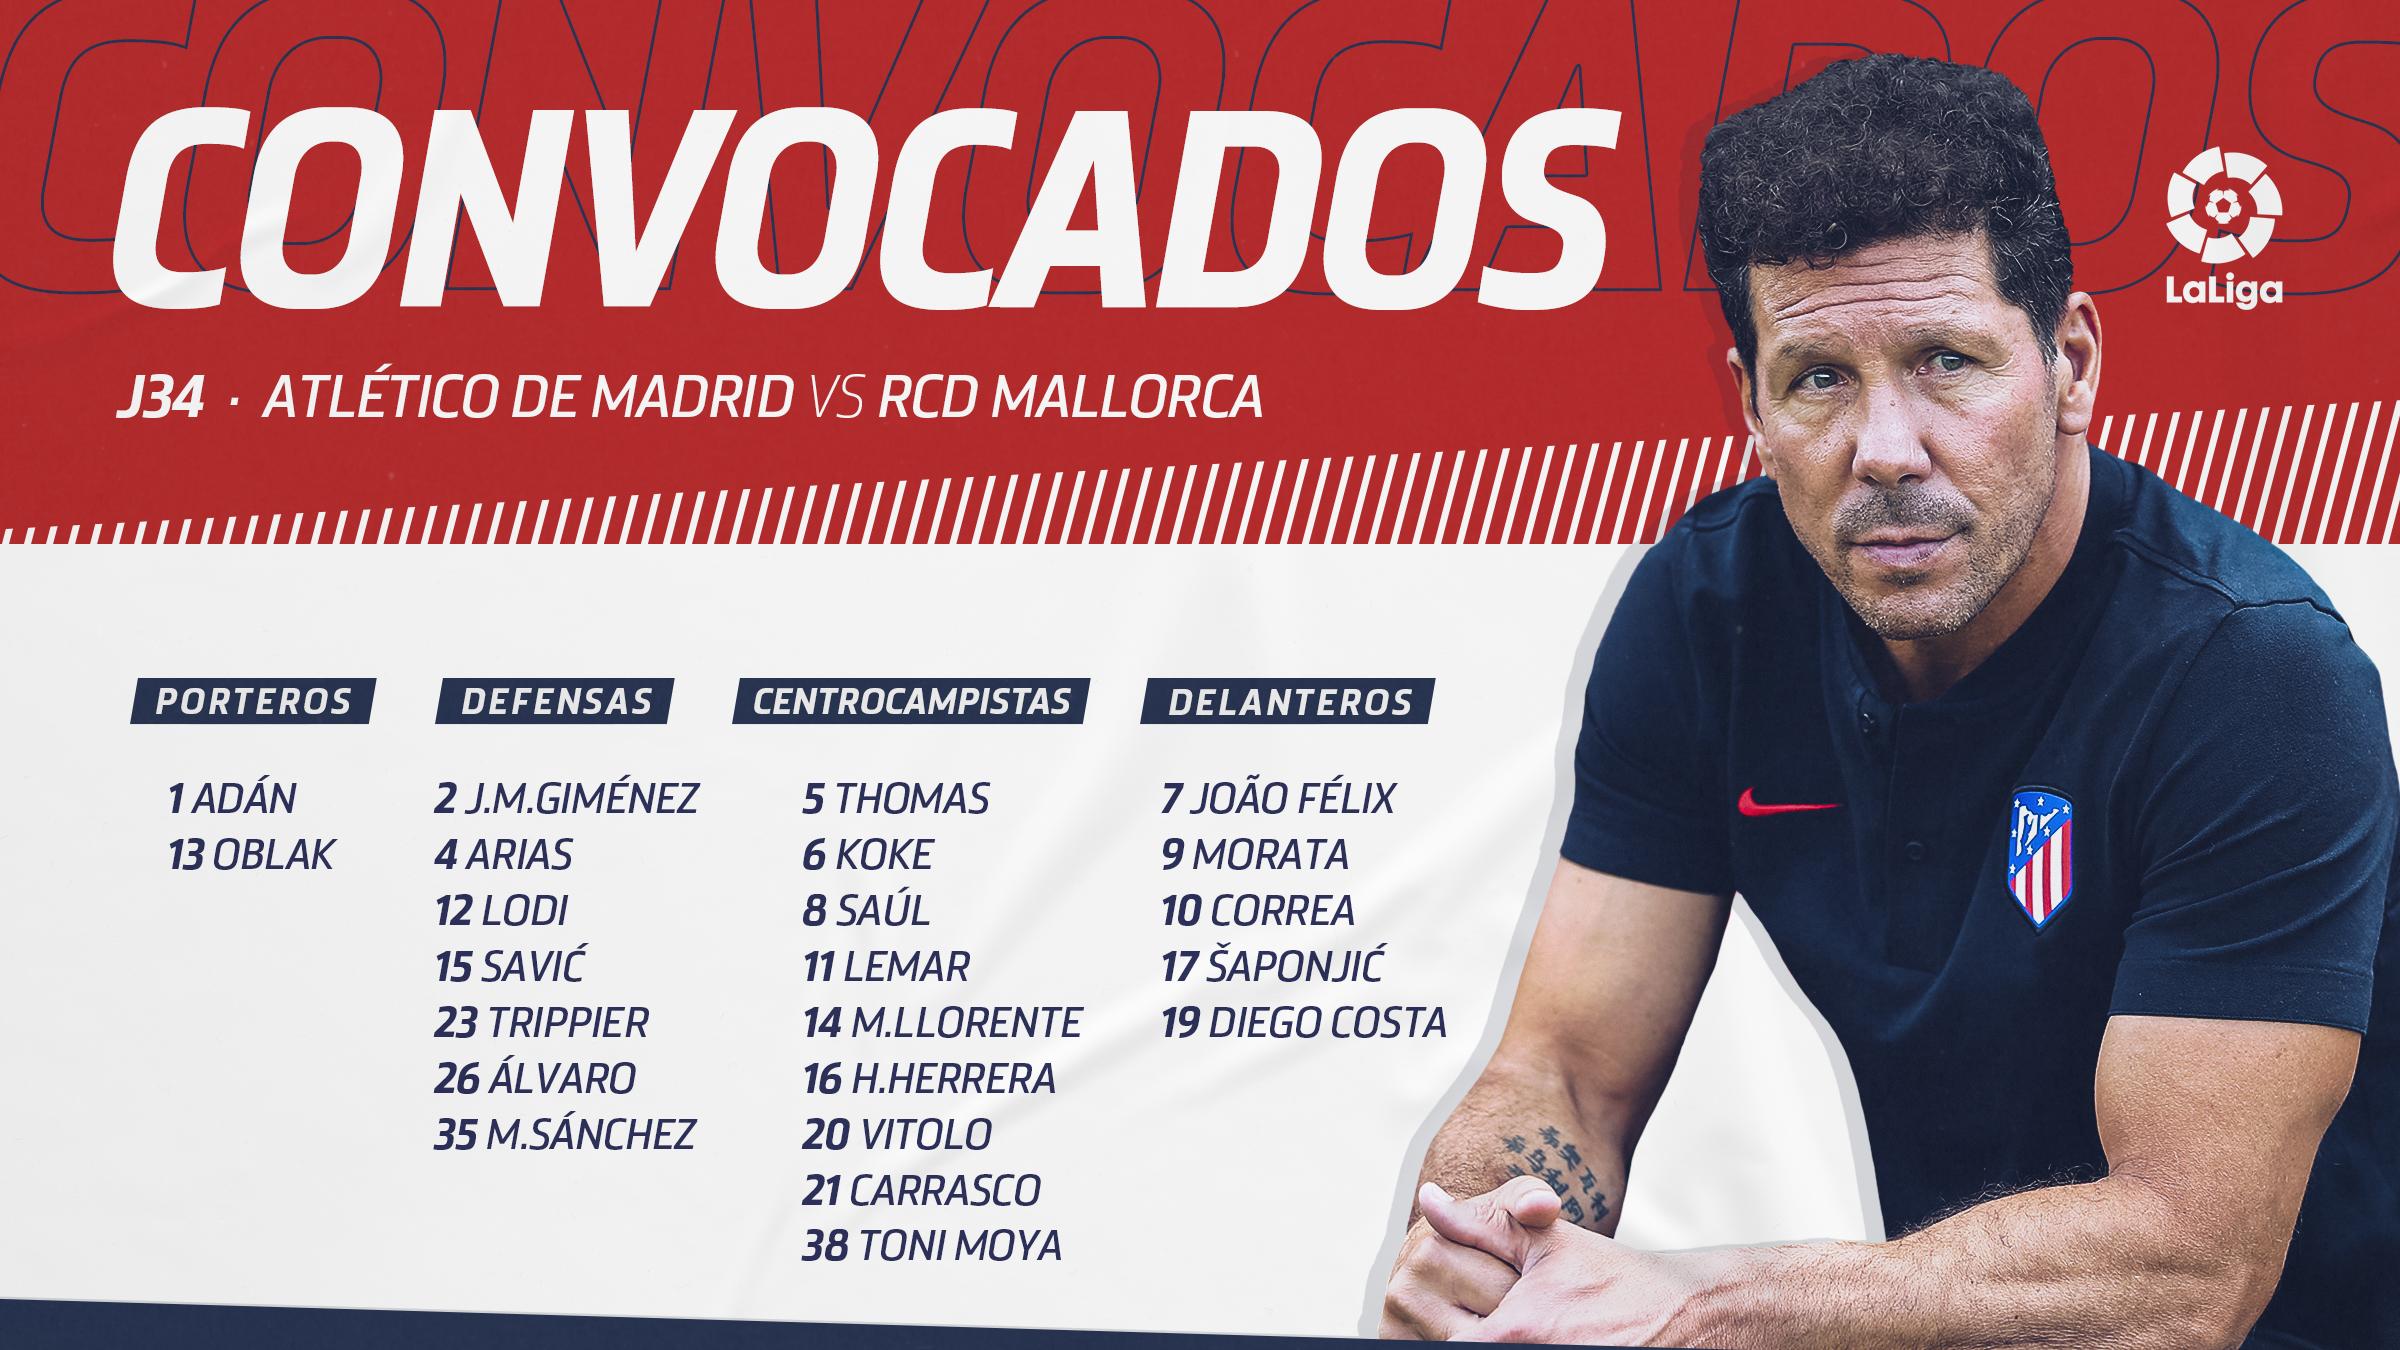 La convocatoria del Atlético de Madrid ante el Mallorca.